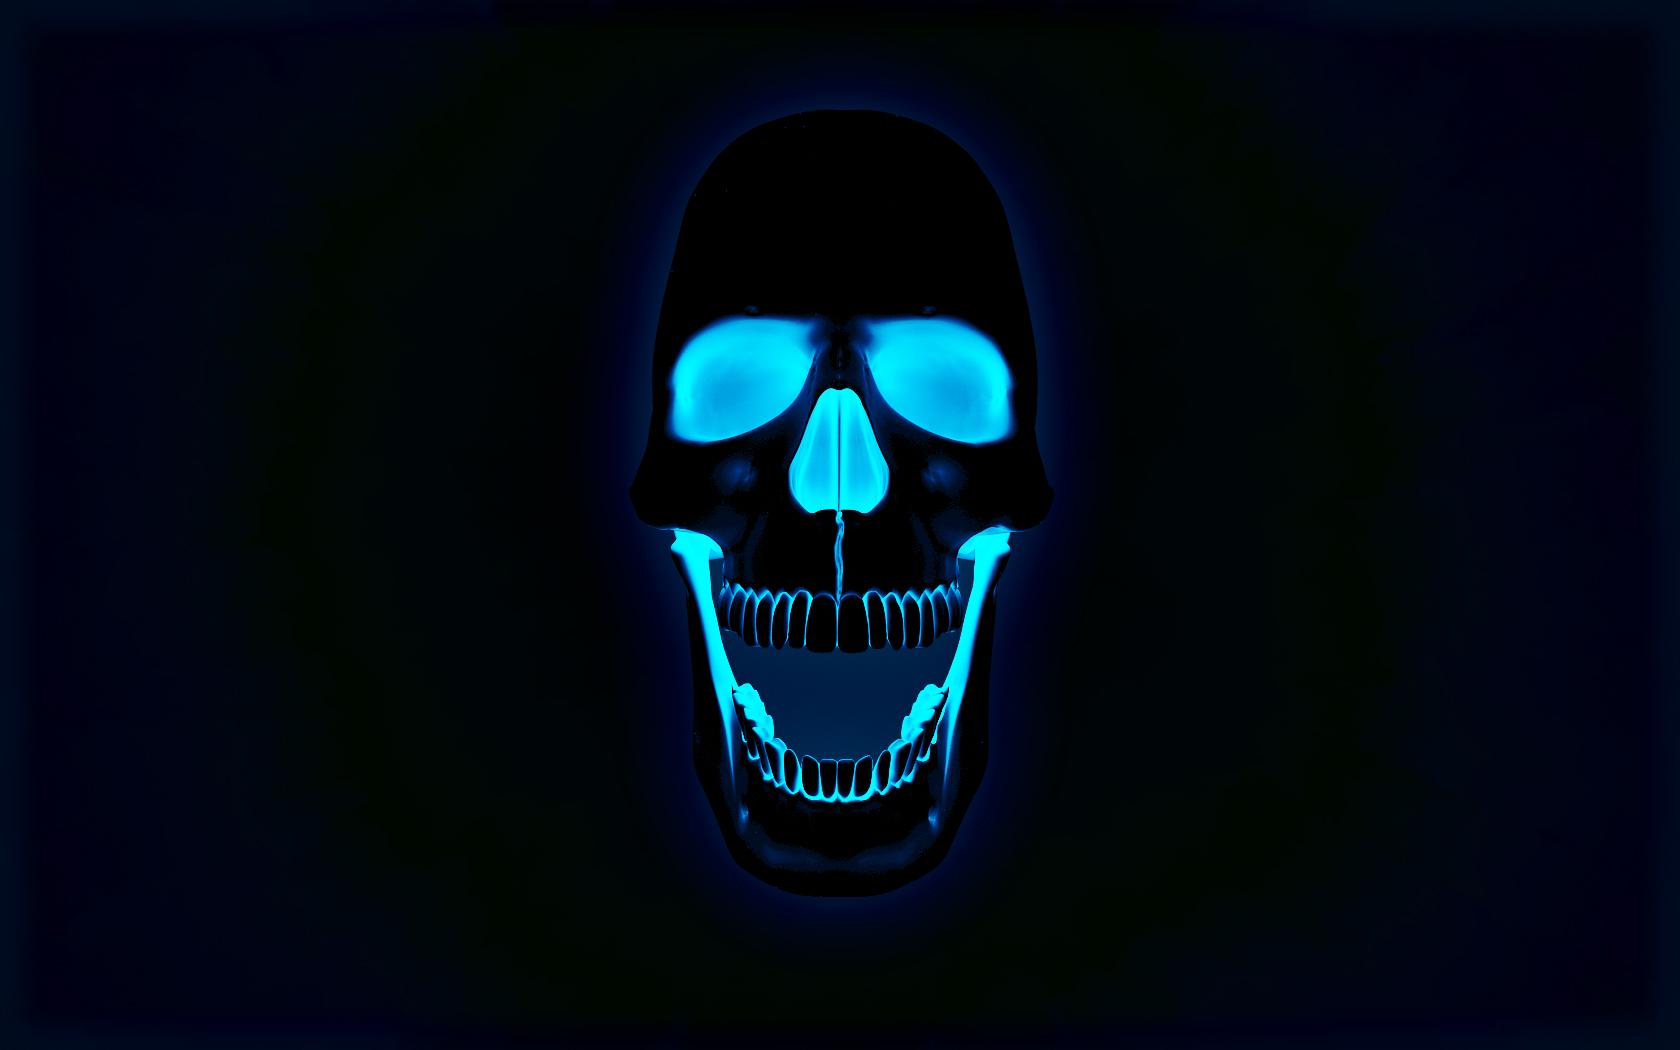 Dark Skull Wallpaper HD 5095 Wallpaper Cool Walldiskpapercom 1680x1050